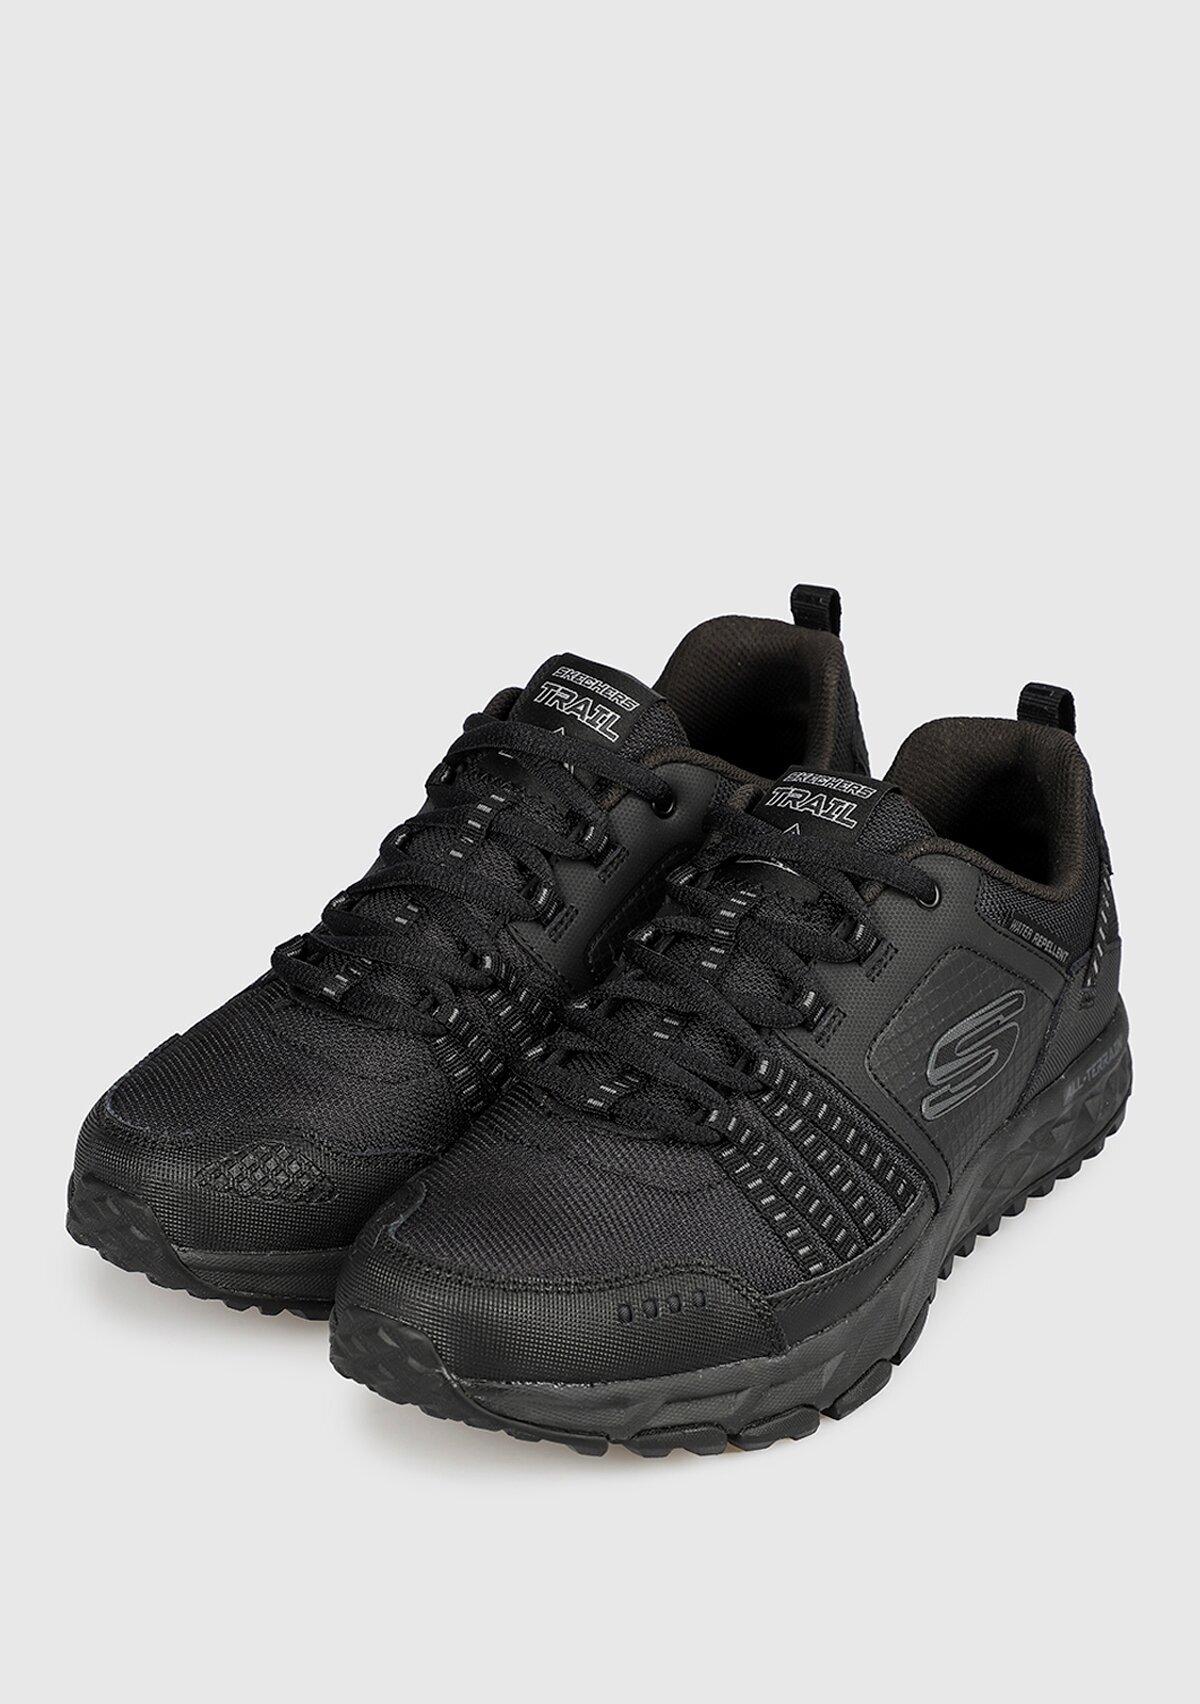 resm Escape Plan Siyah Erkek Sneaker 51591Bbk